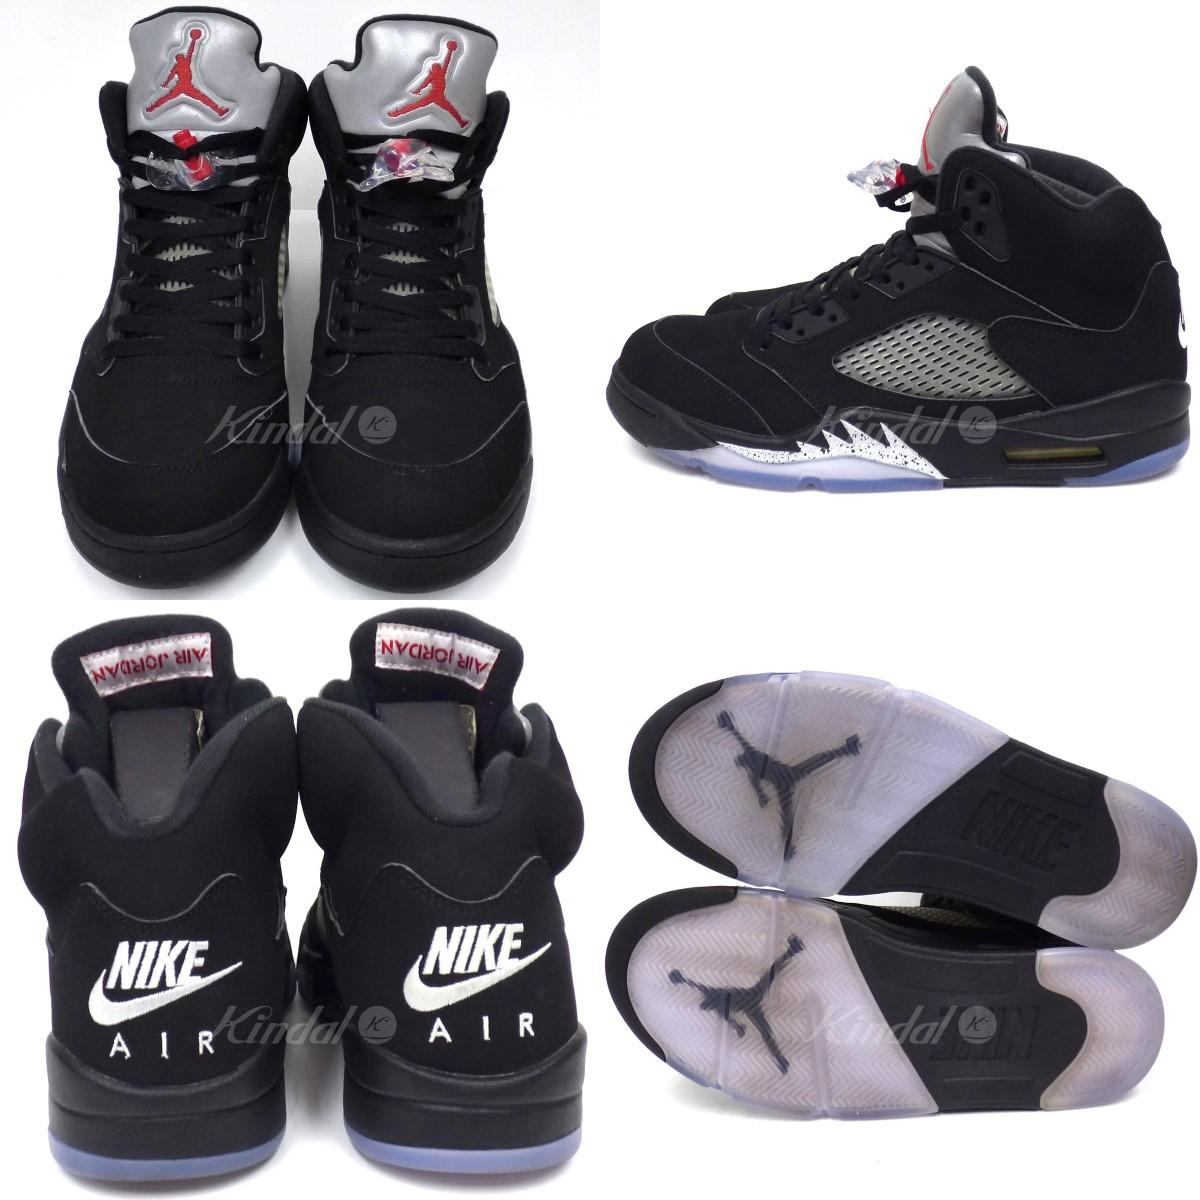 2a2155c2ff2ab5 kindal  NIKE Air Jordan 5 Retro OG Black Metallic空气乔丹运动鞋黑色 ...